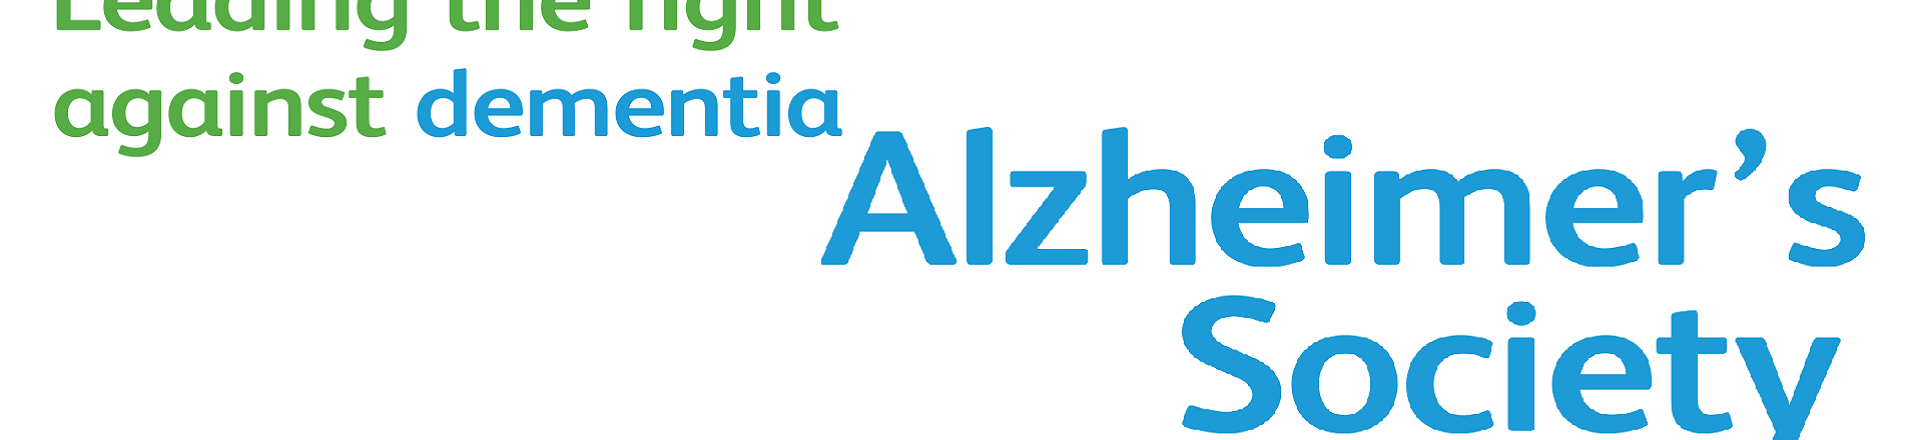 Working for Alzheimer's Society